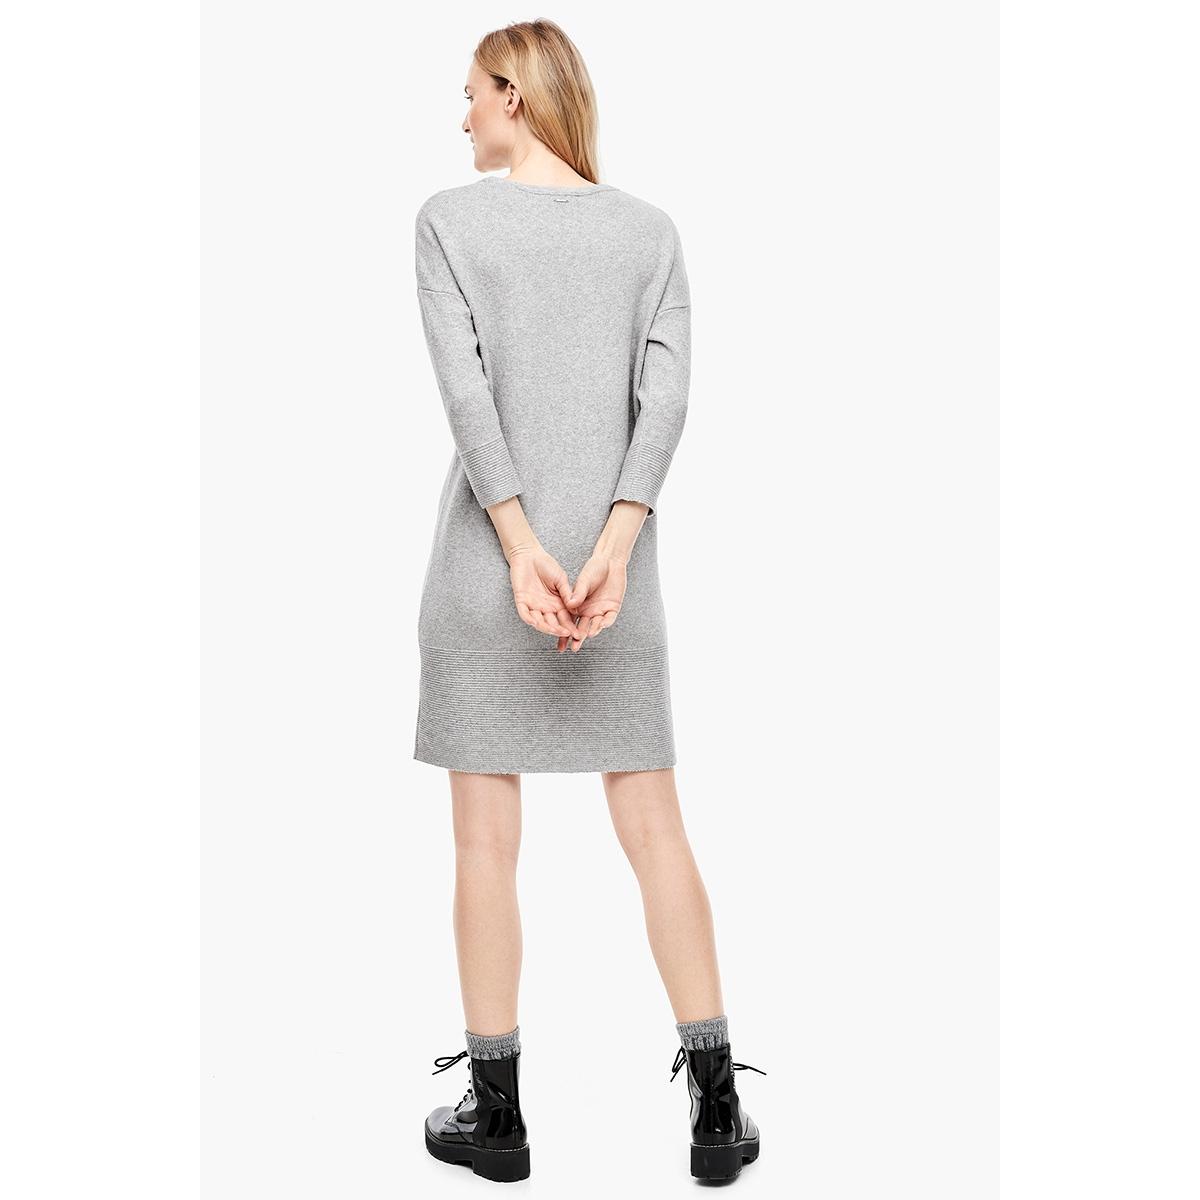 gemeleerde jurk 21912823963 s.oliver jurk 9400